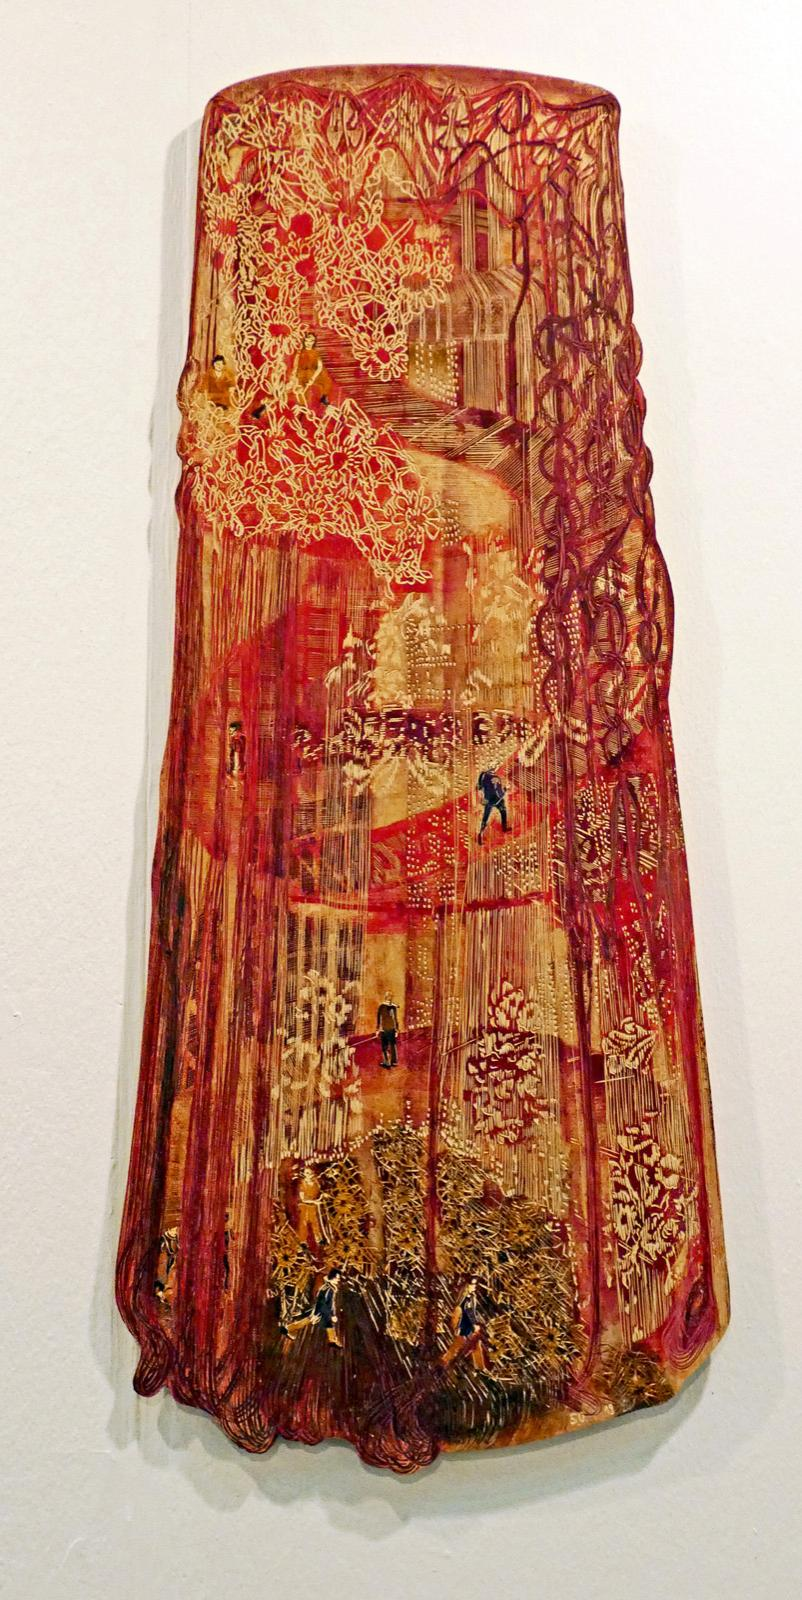 Spitzenlauf (Aufwärts immer...), 2019, 120 x 50 cm, linolschnitt, Alkydfarbe